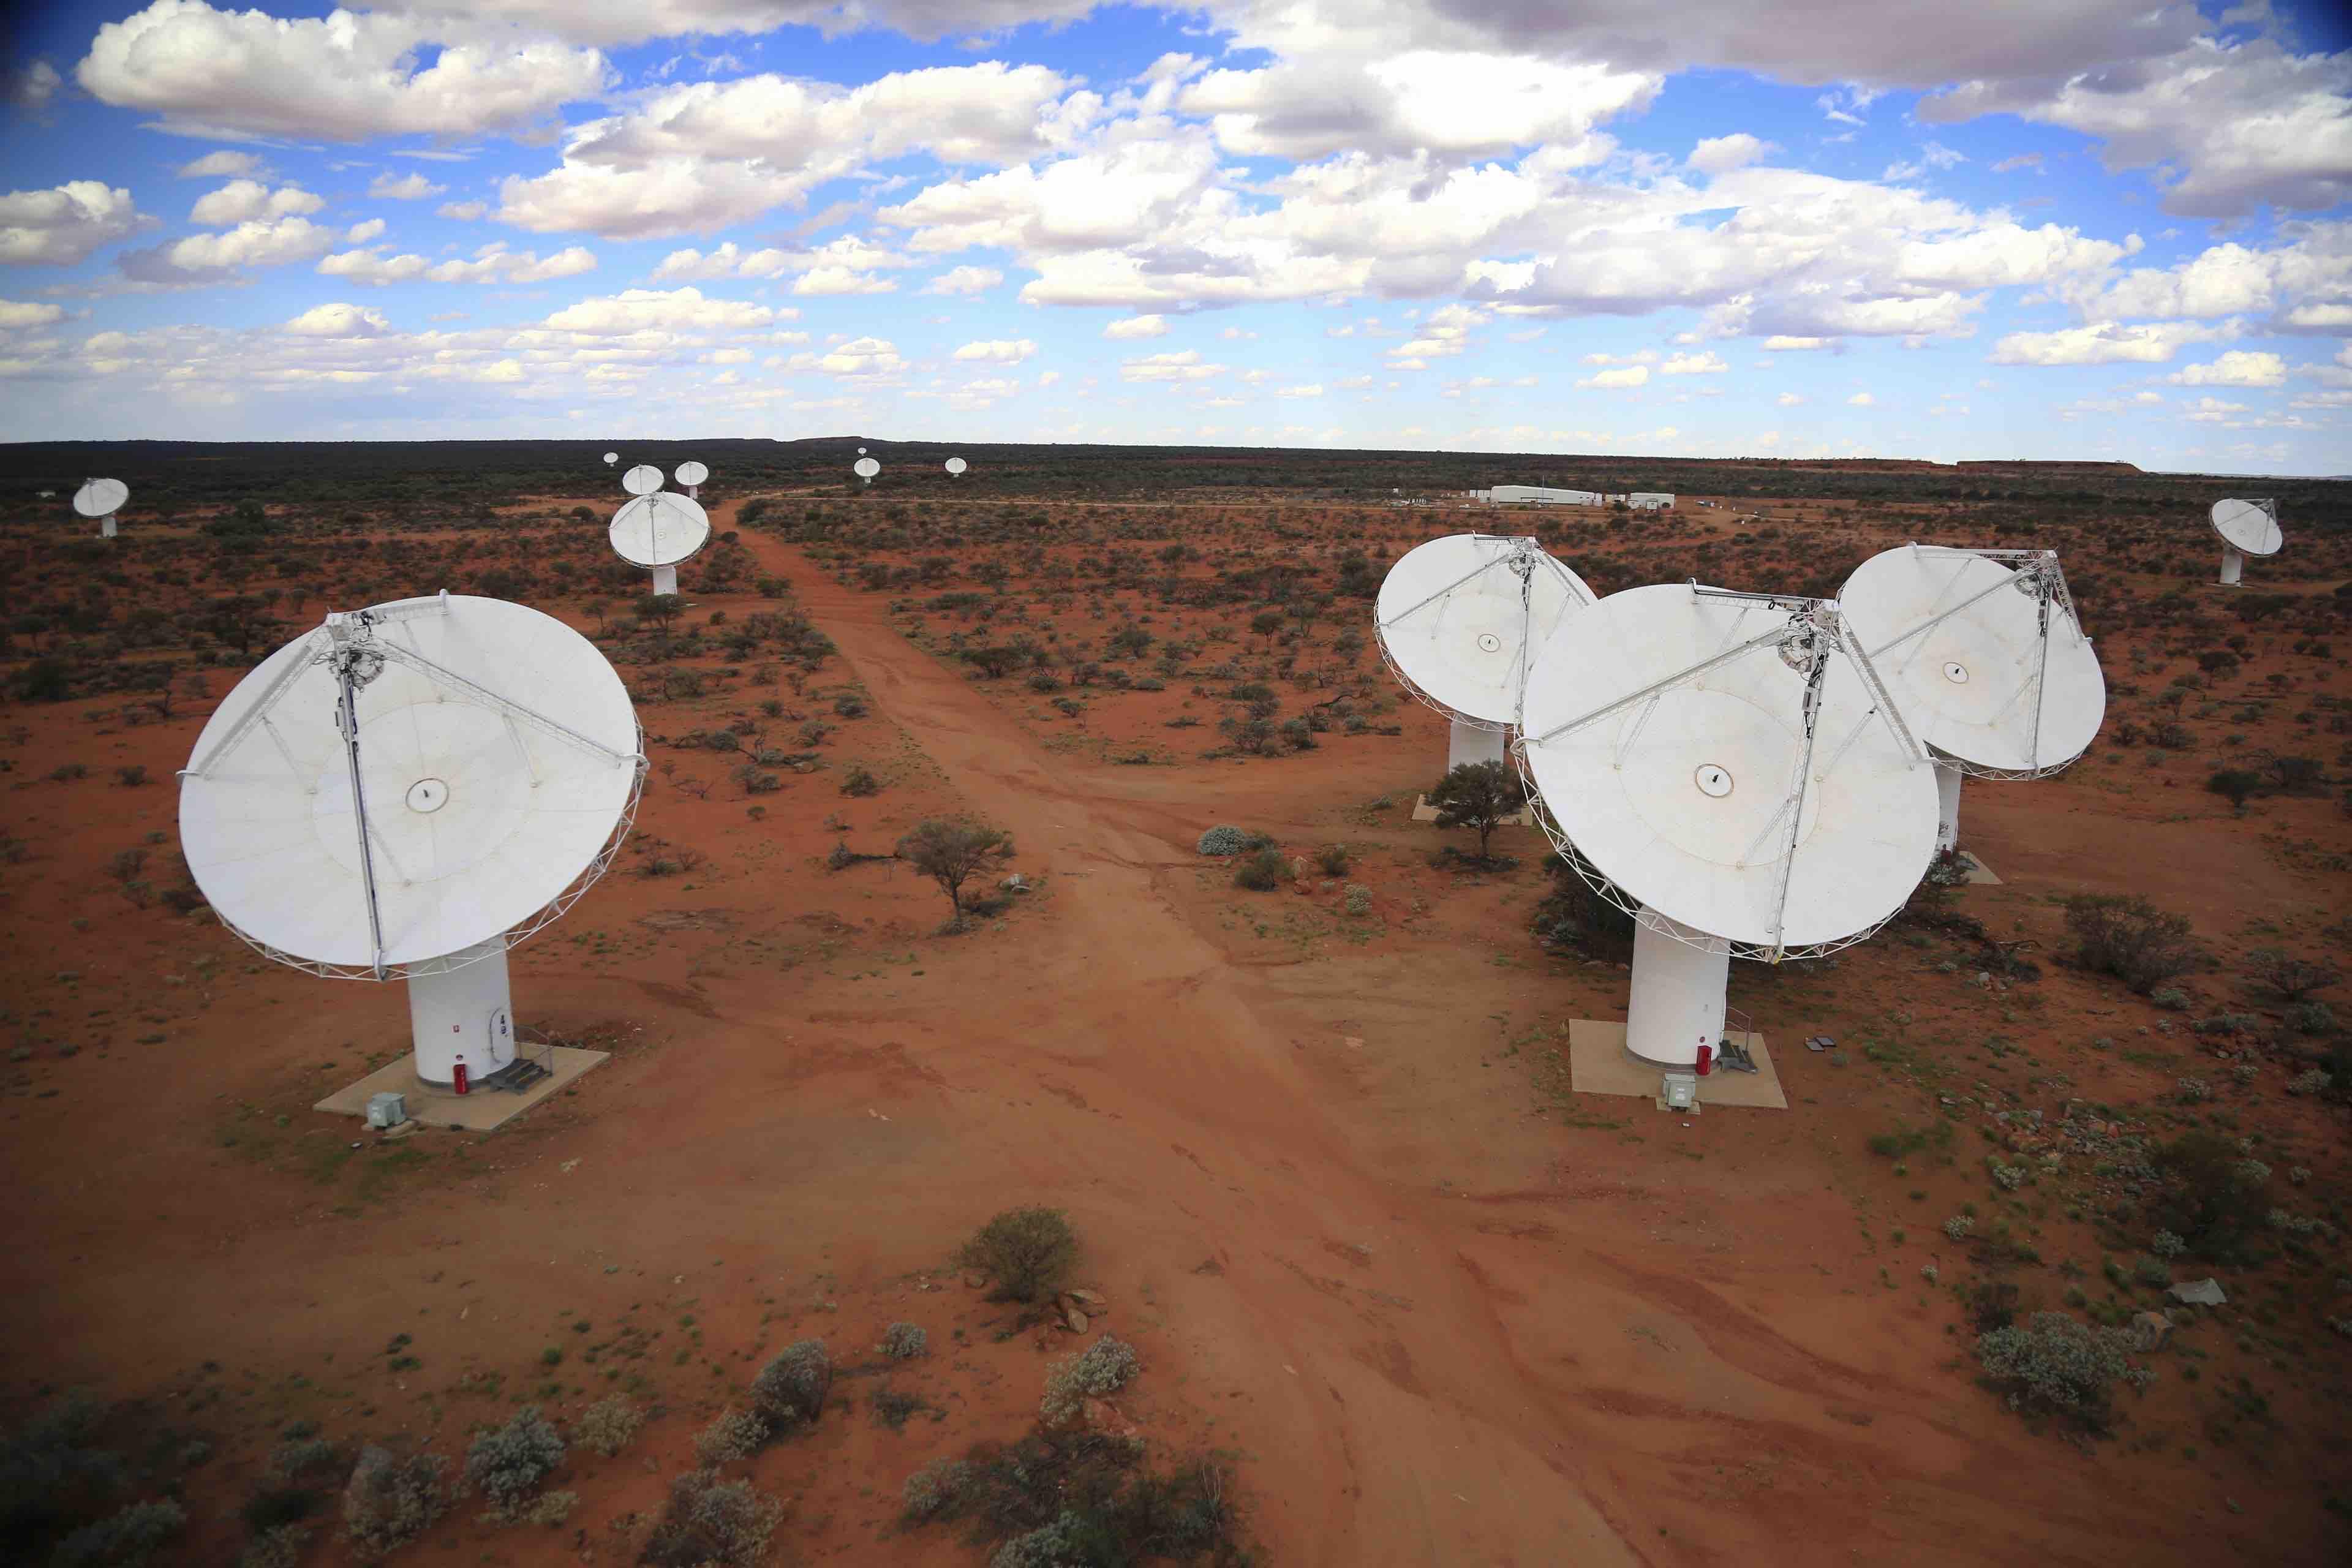 Credit: CSIRO